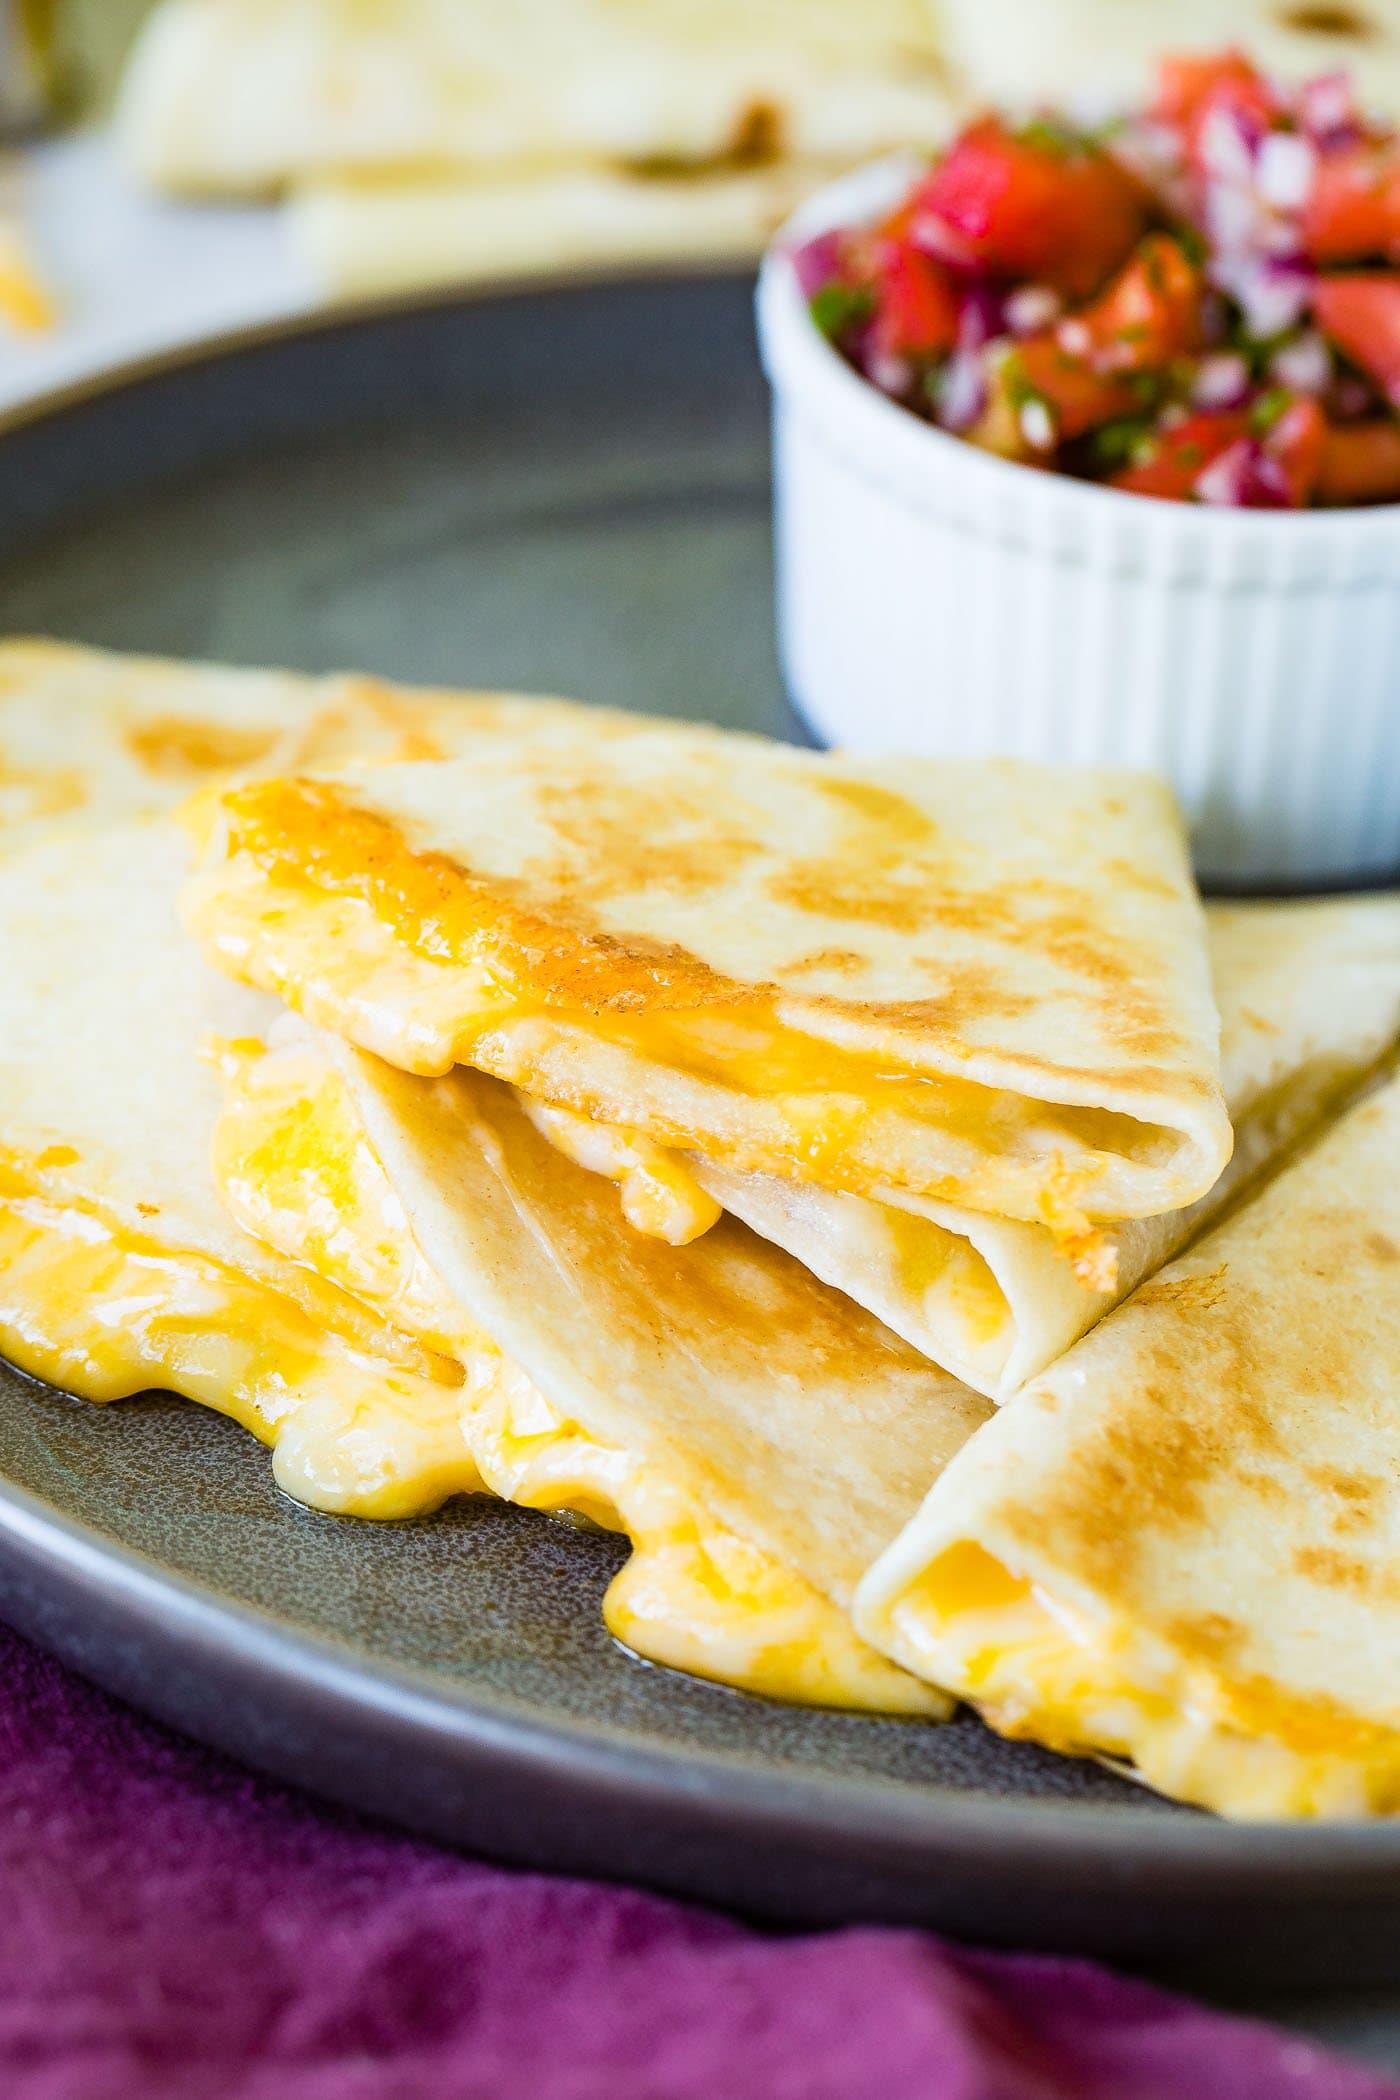 The BEST Quesadilla Recipe (Easy & Cheesy!) - Oh Sweet Basil